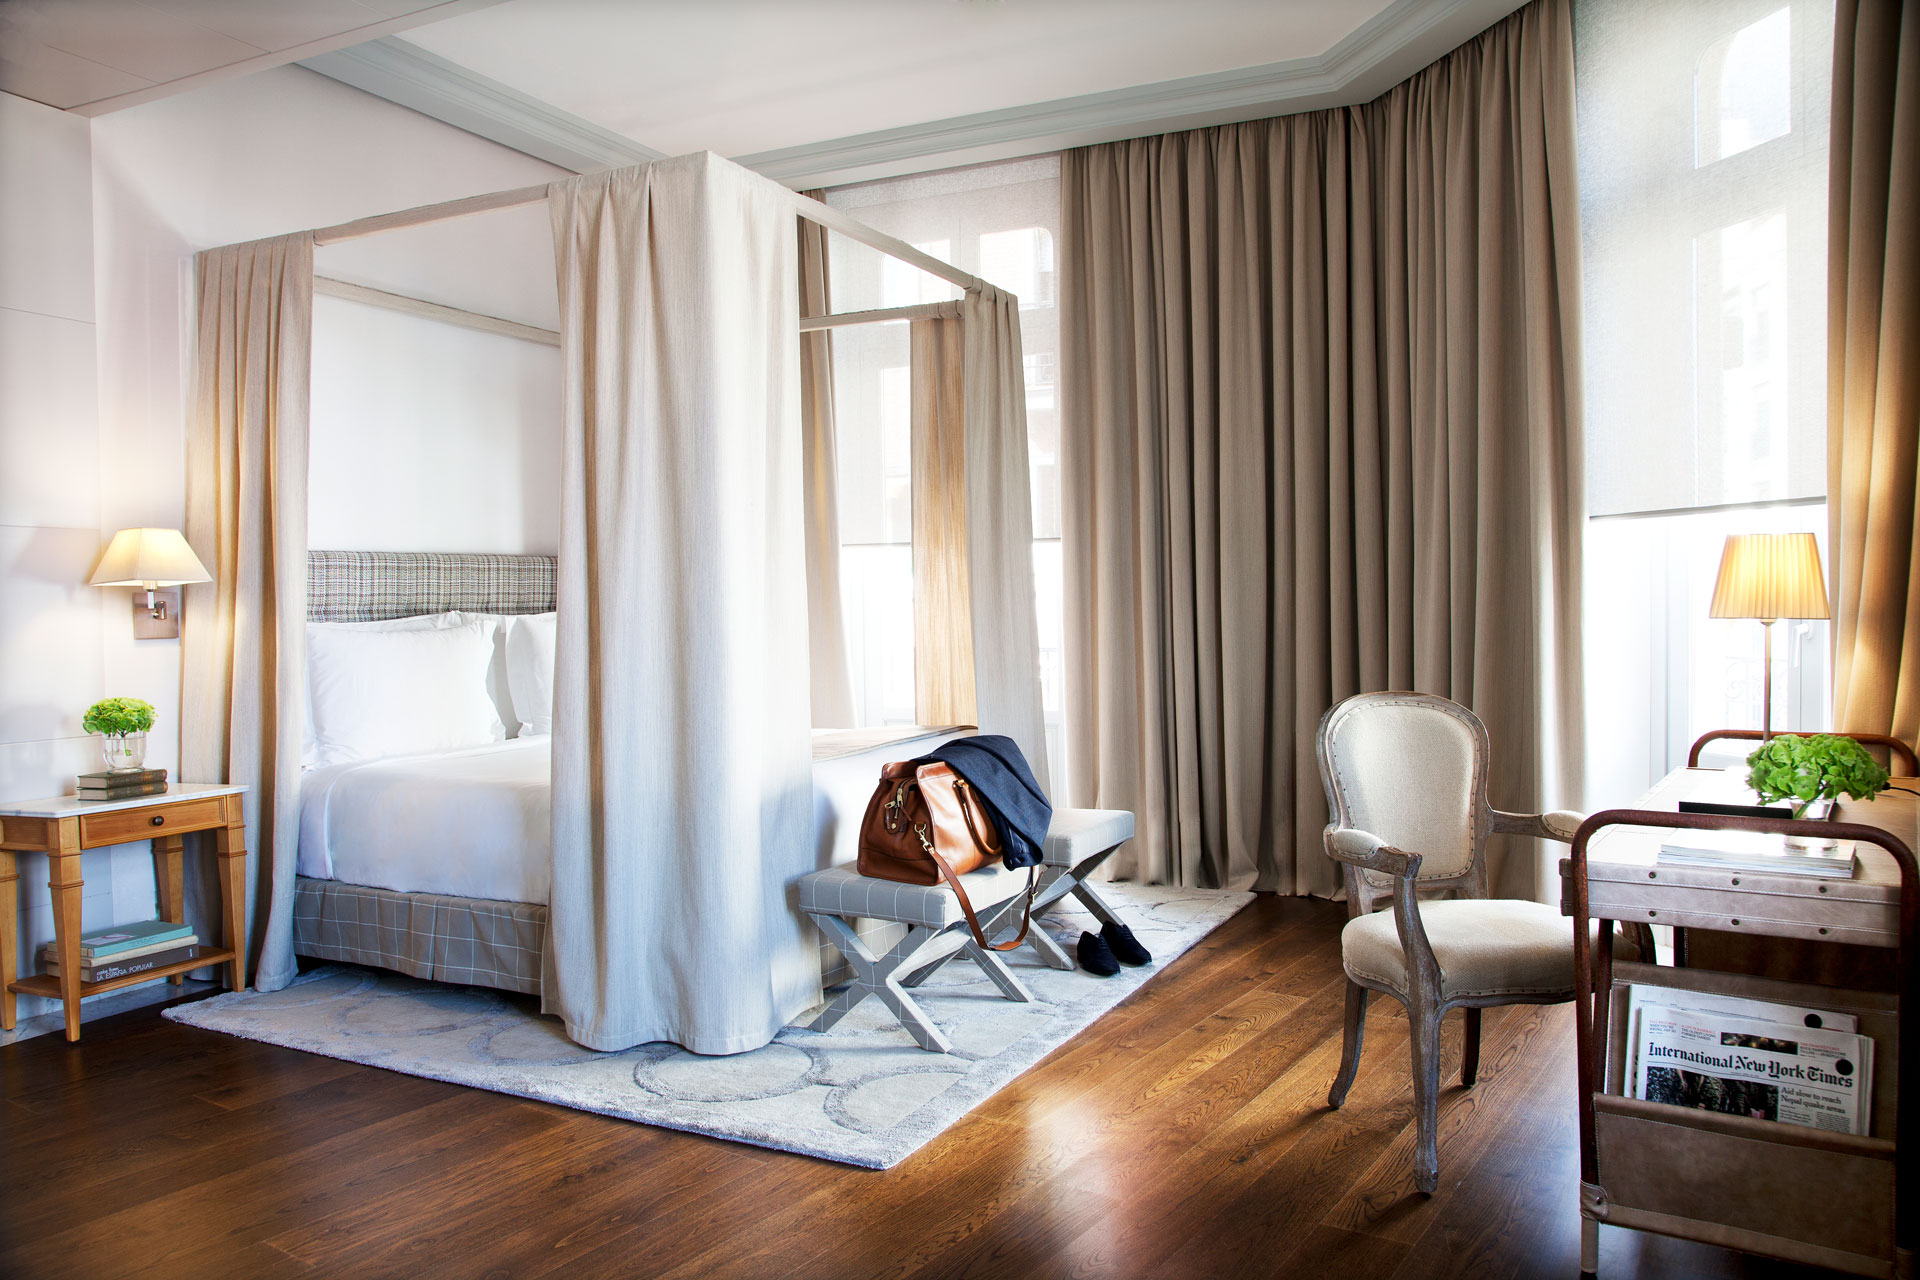 Junior-Suite-Habitacion-URSO-Hotel-Spa-Madrid.jpg